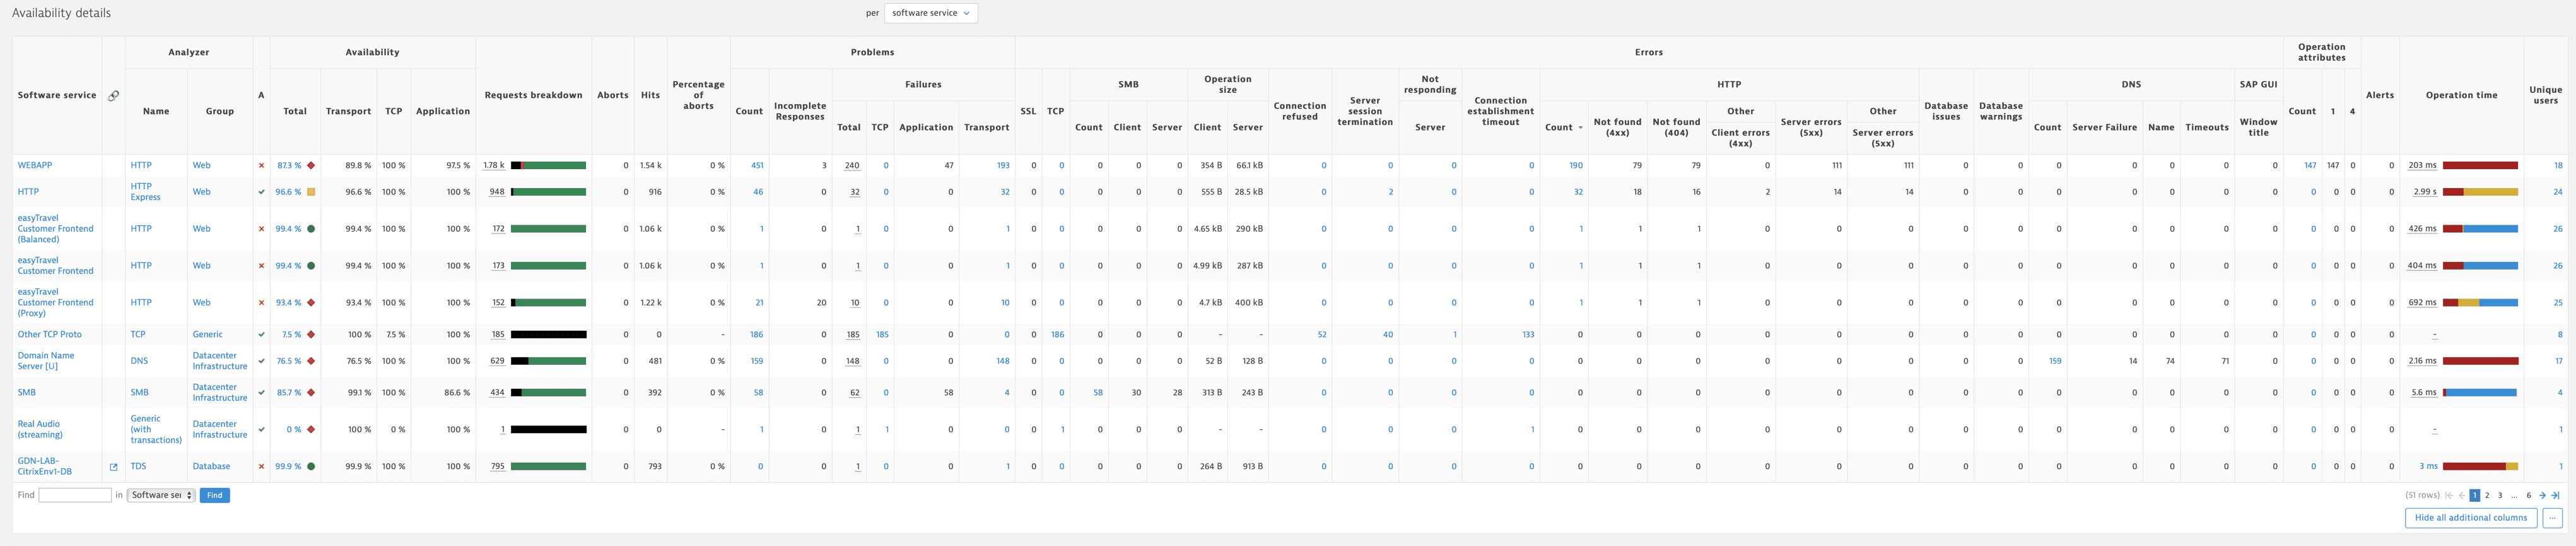 Error explorer: Show all additional columns